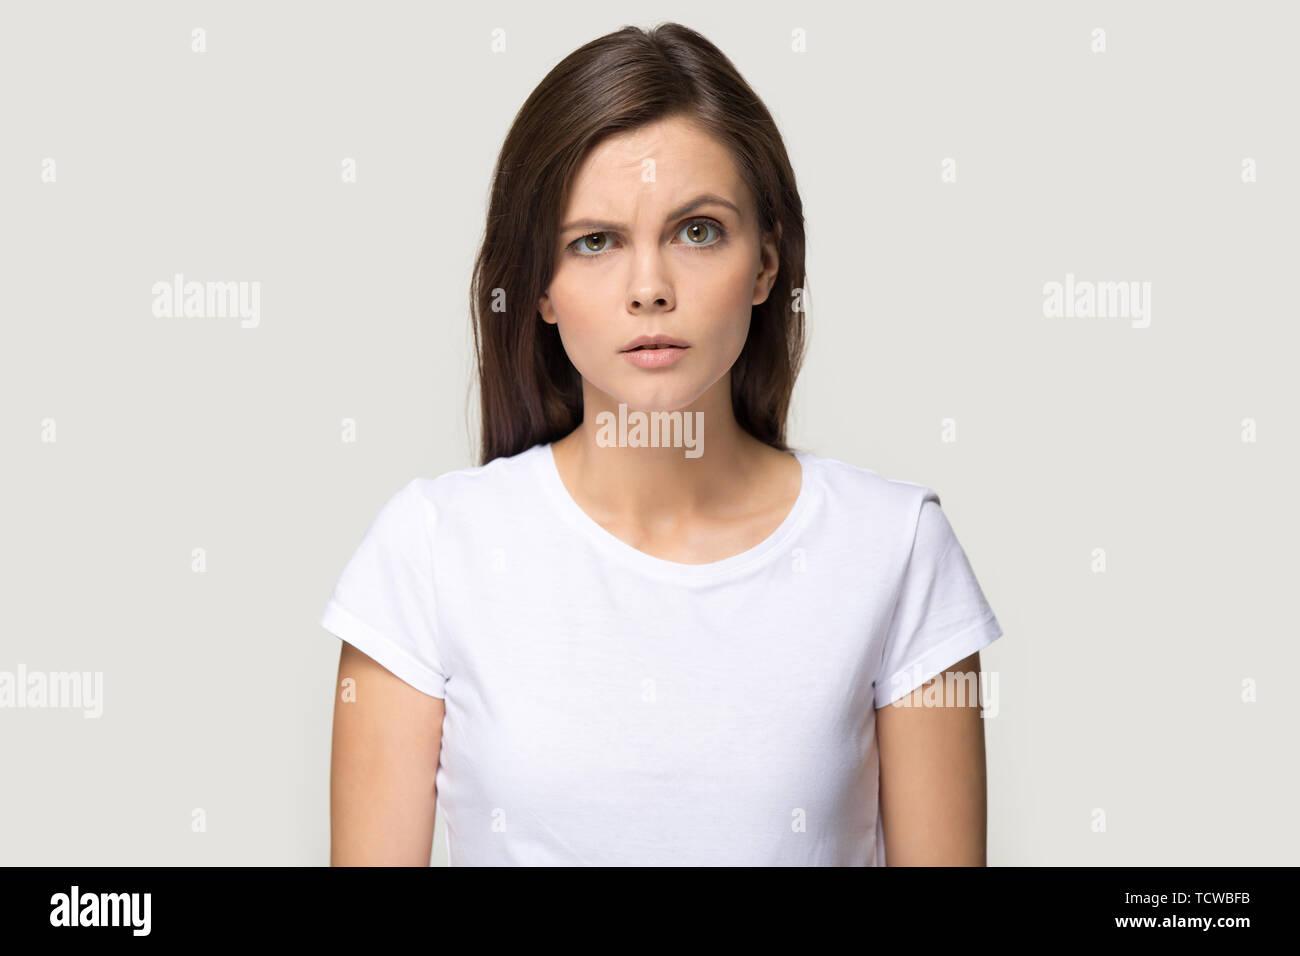 Sceptic suspicious millennial woman pose on grey studio background - Stock Image